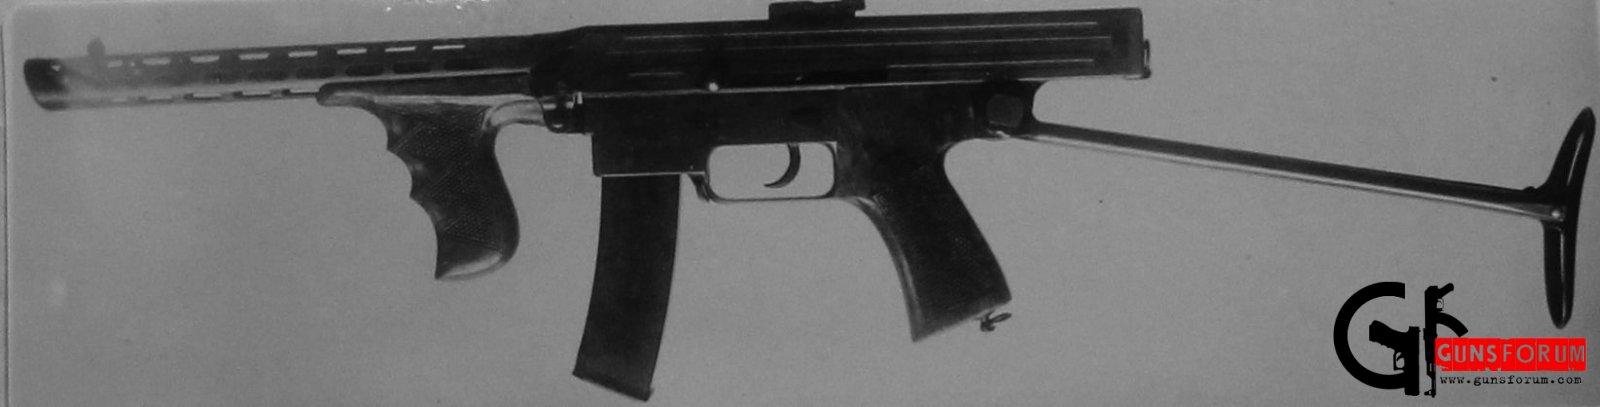 Kalashnikov submachine gun 1942 / пистолет-пулемет Калашникова (обр.1942)